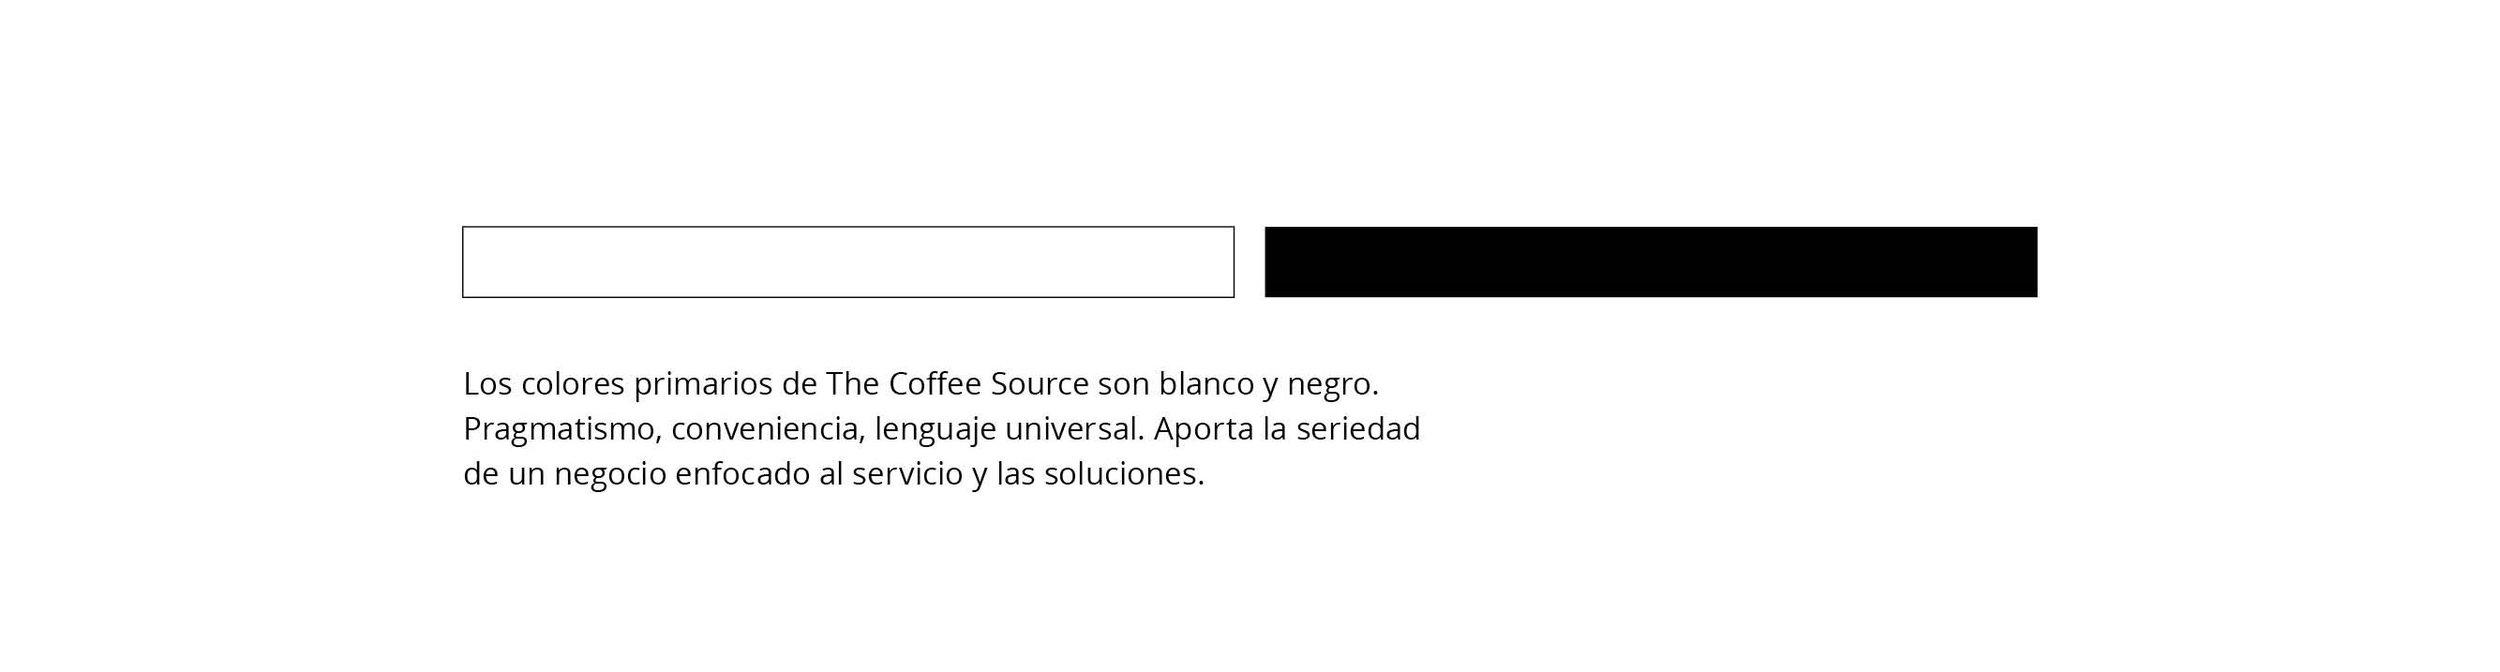 the coffee source_gallery4.jpg